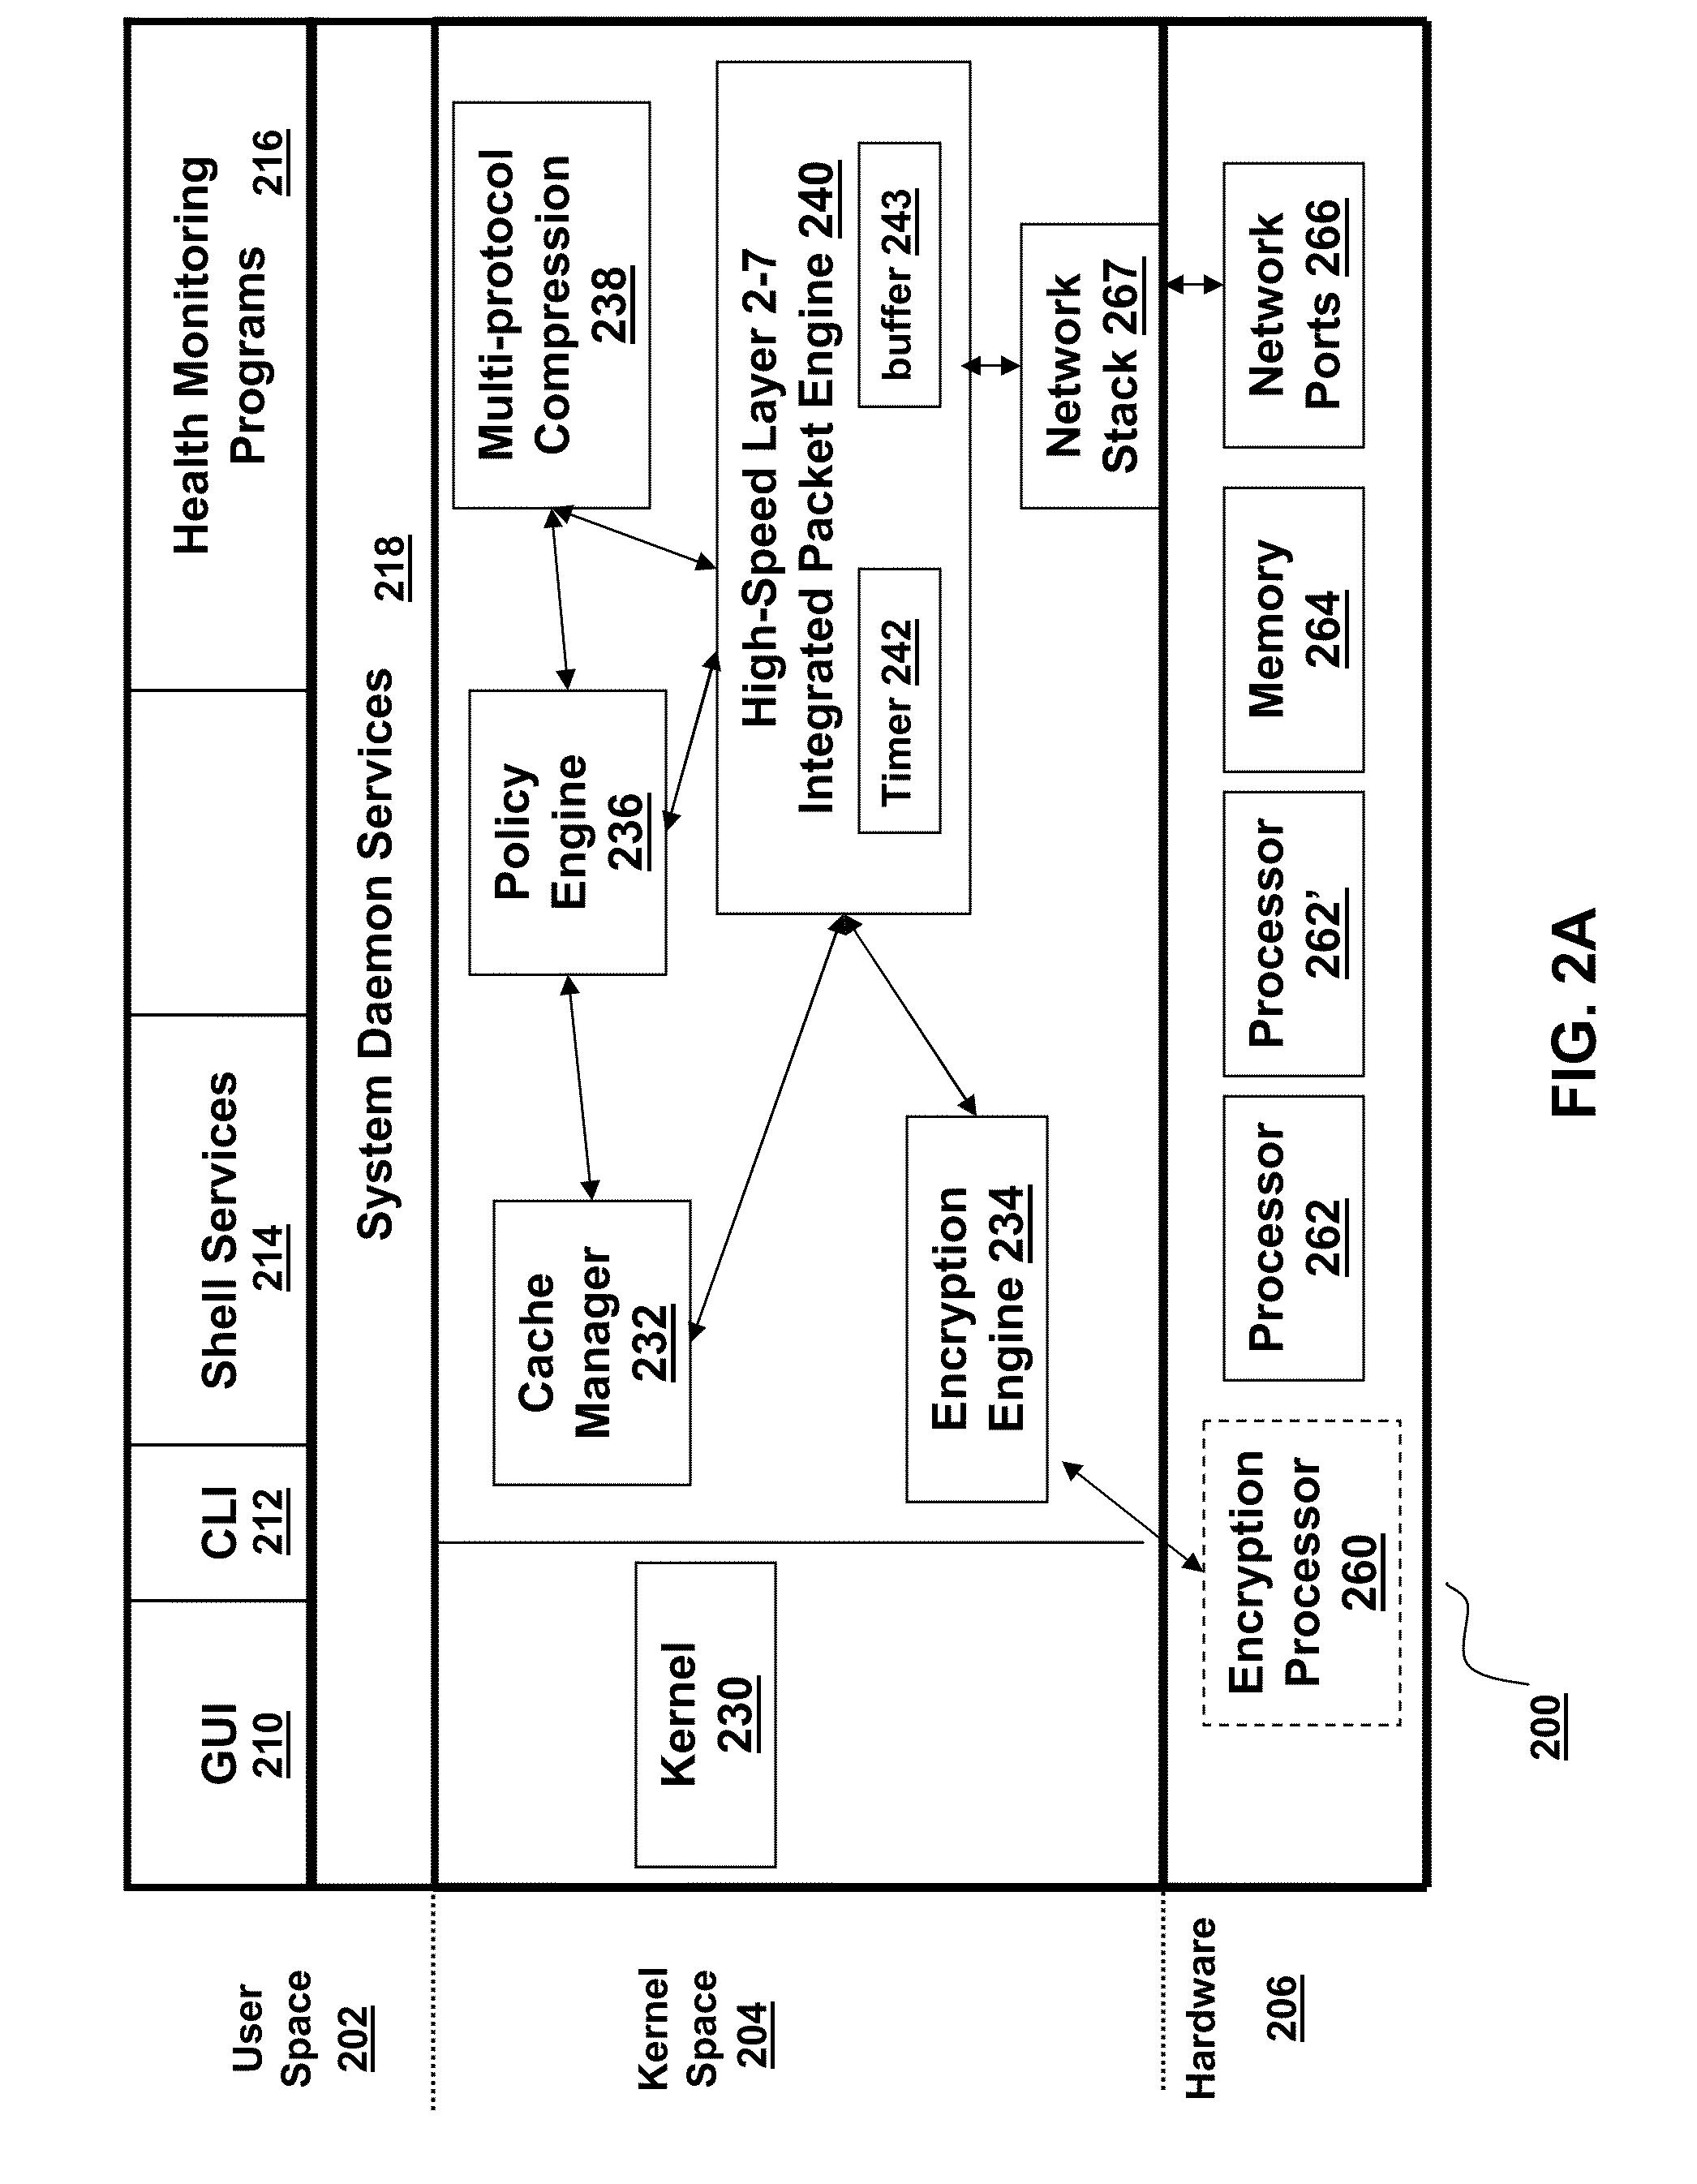 Patent US 8,090,877 B2